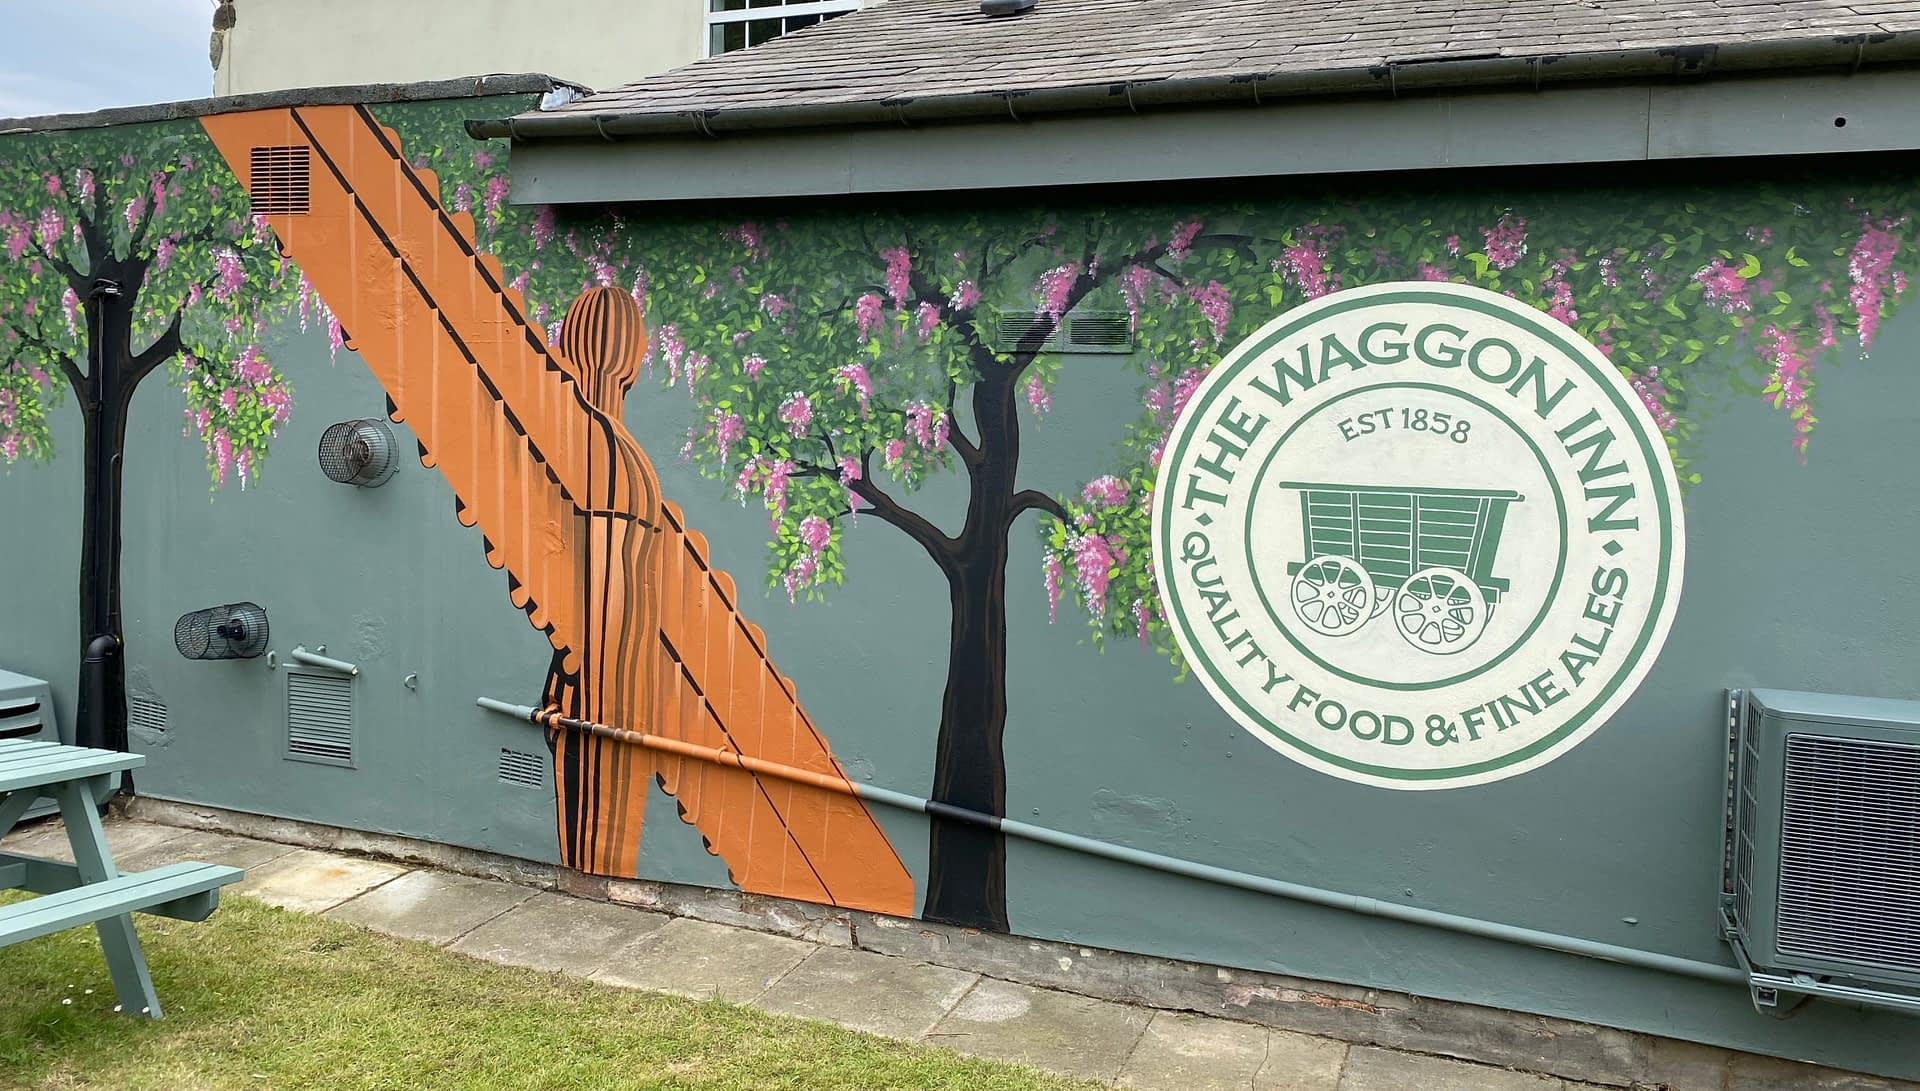 The Waggon Inn Beer Garden